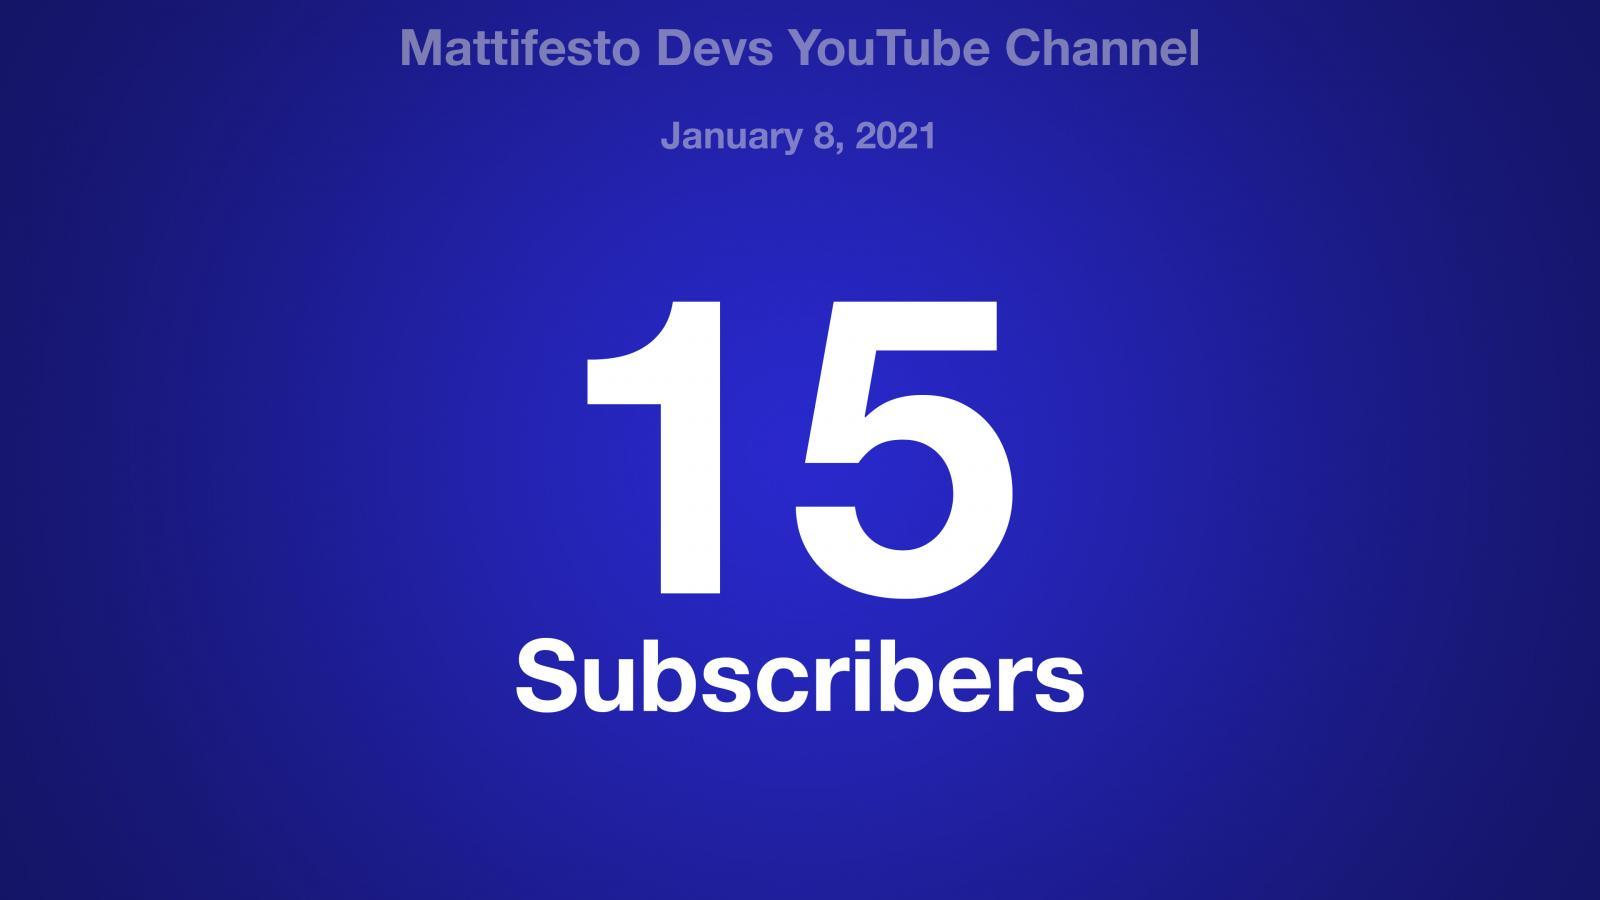 Mattifesto Devs YouTube Channel, January 8, 2021, 15 Subscribers